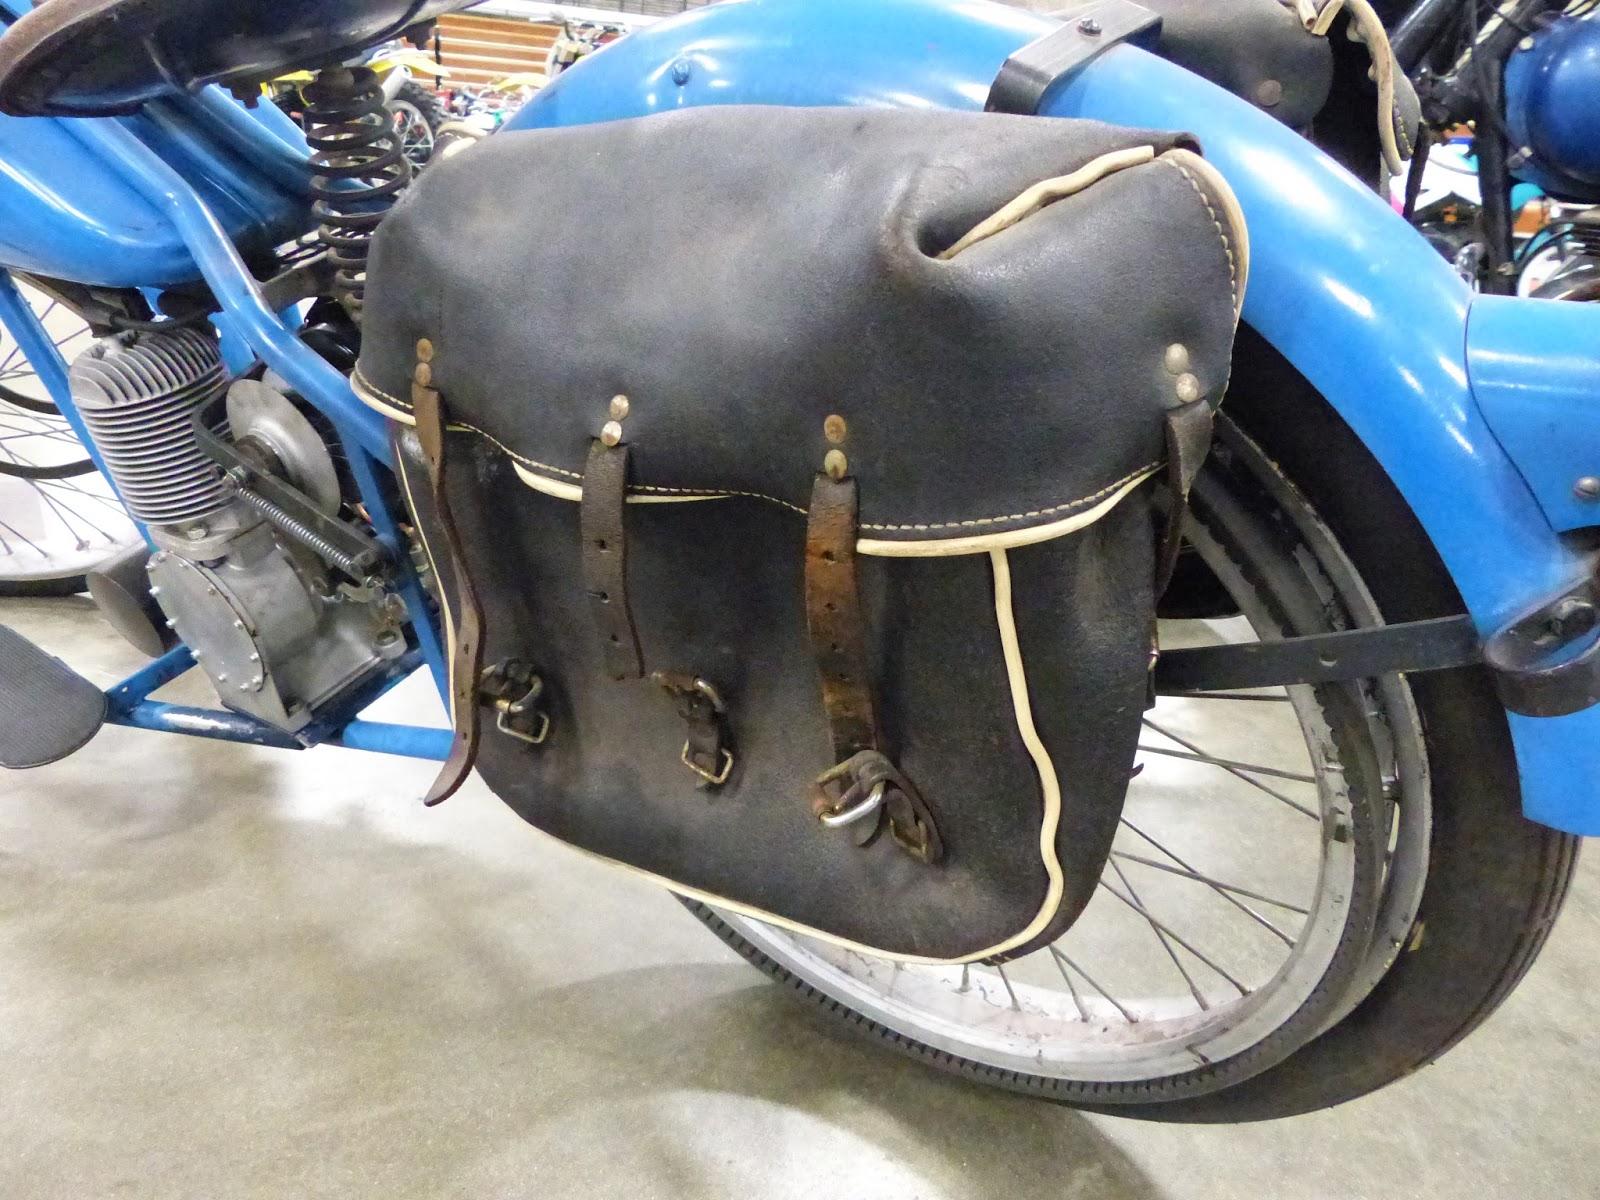 1970 Harley Davidson Evel Knievel Tribute: OldMotoDude: 1955 Simplex 130cc Servi-Cycle On Display At